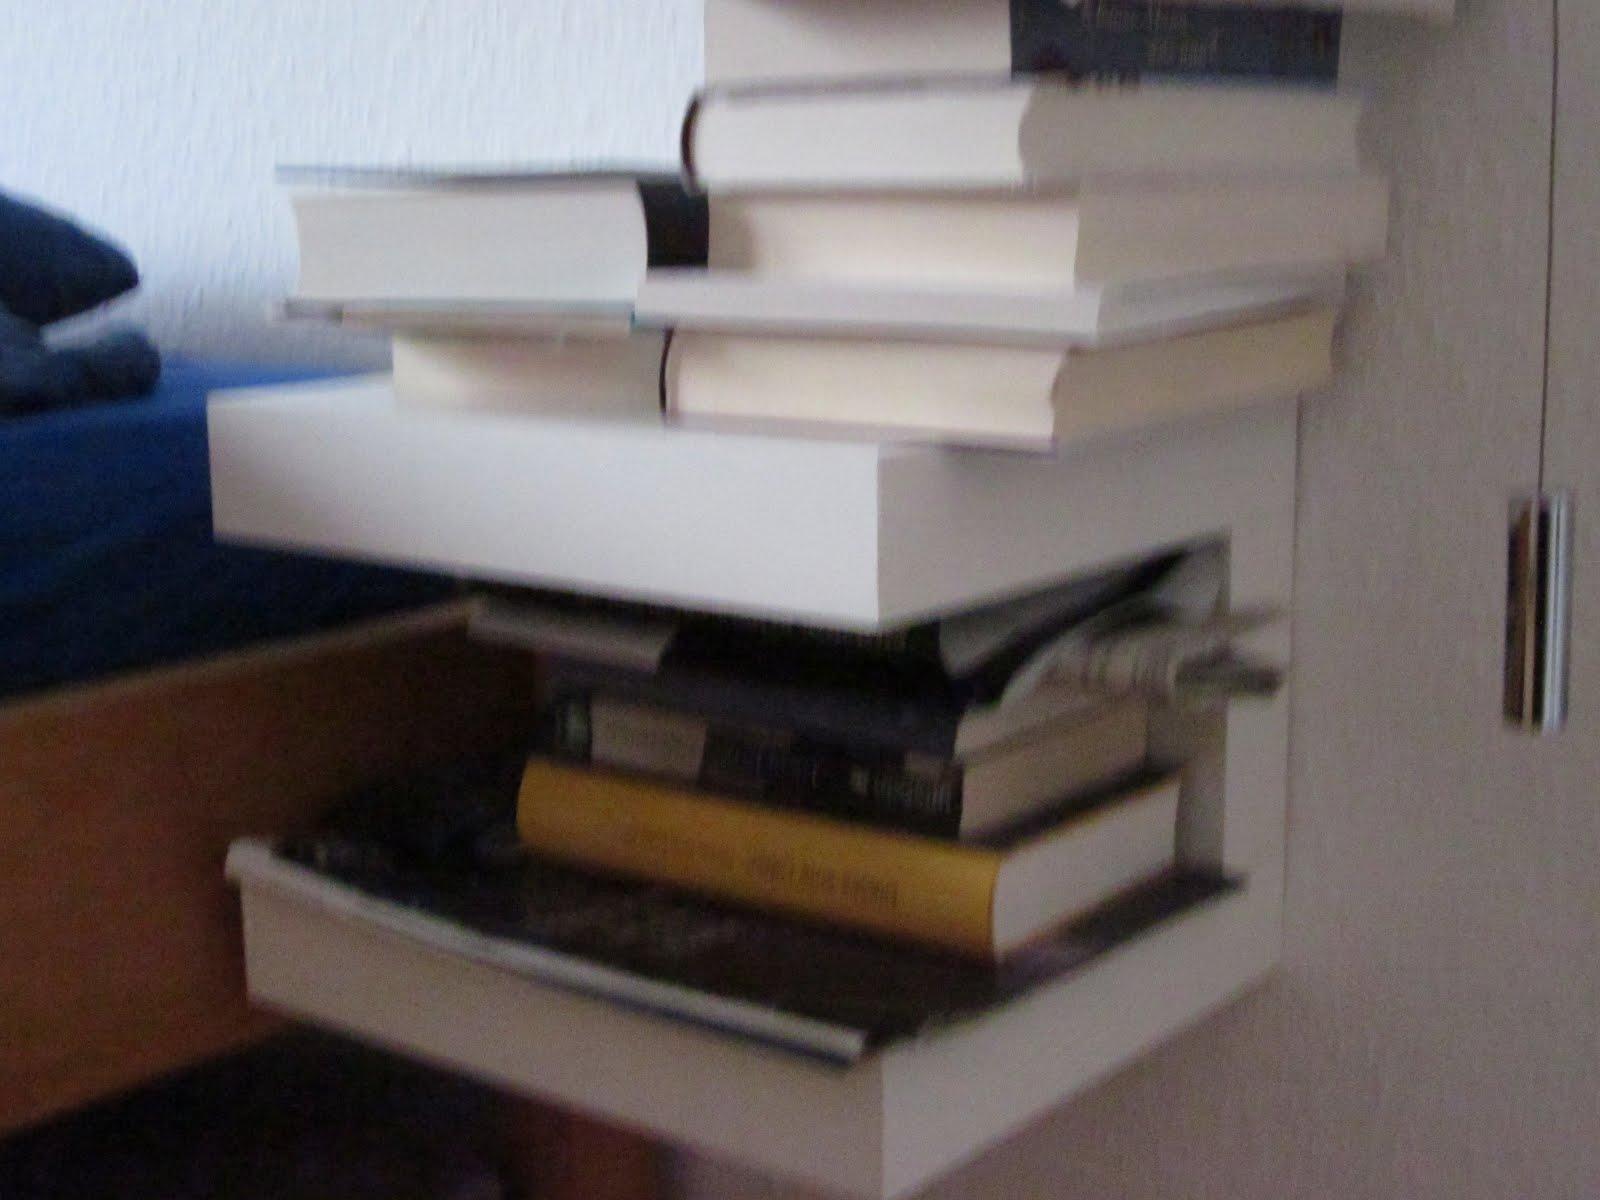 Ikea Lack Shelf Hack Lack Archives Page 5 Of 30 Ikea Hackers Archive Ikea Hackers